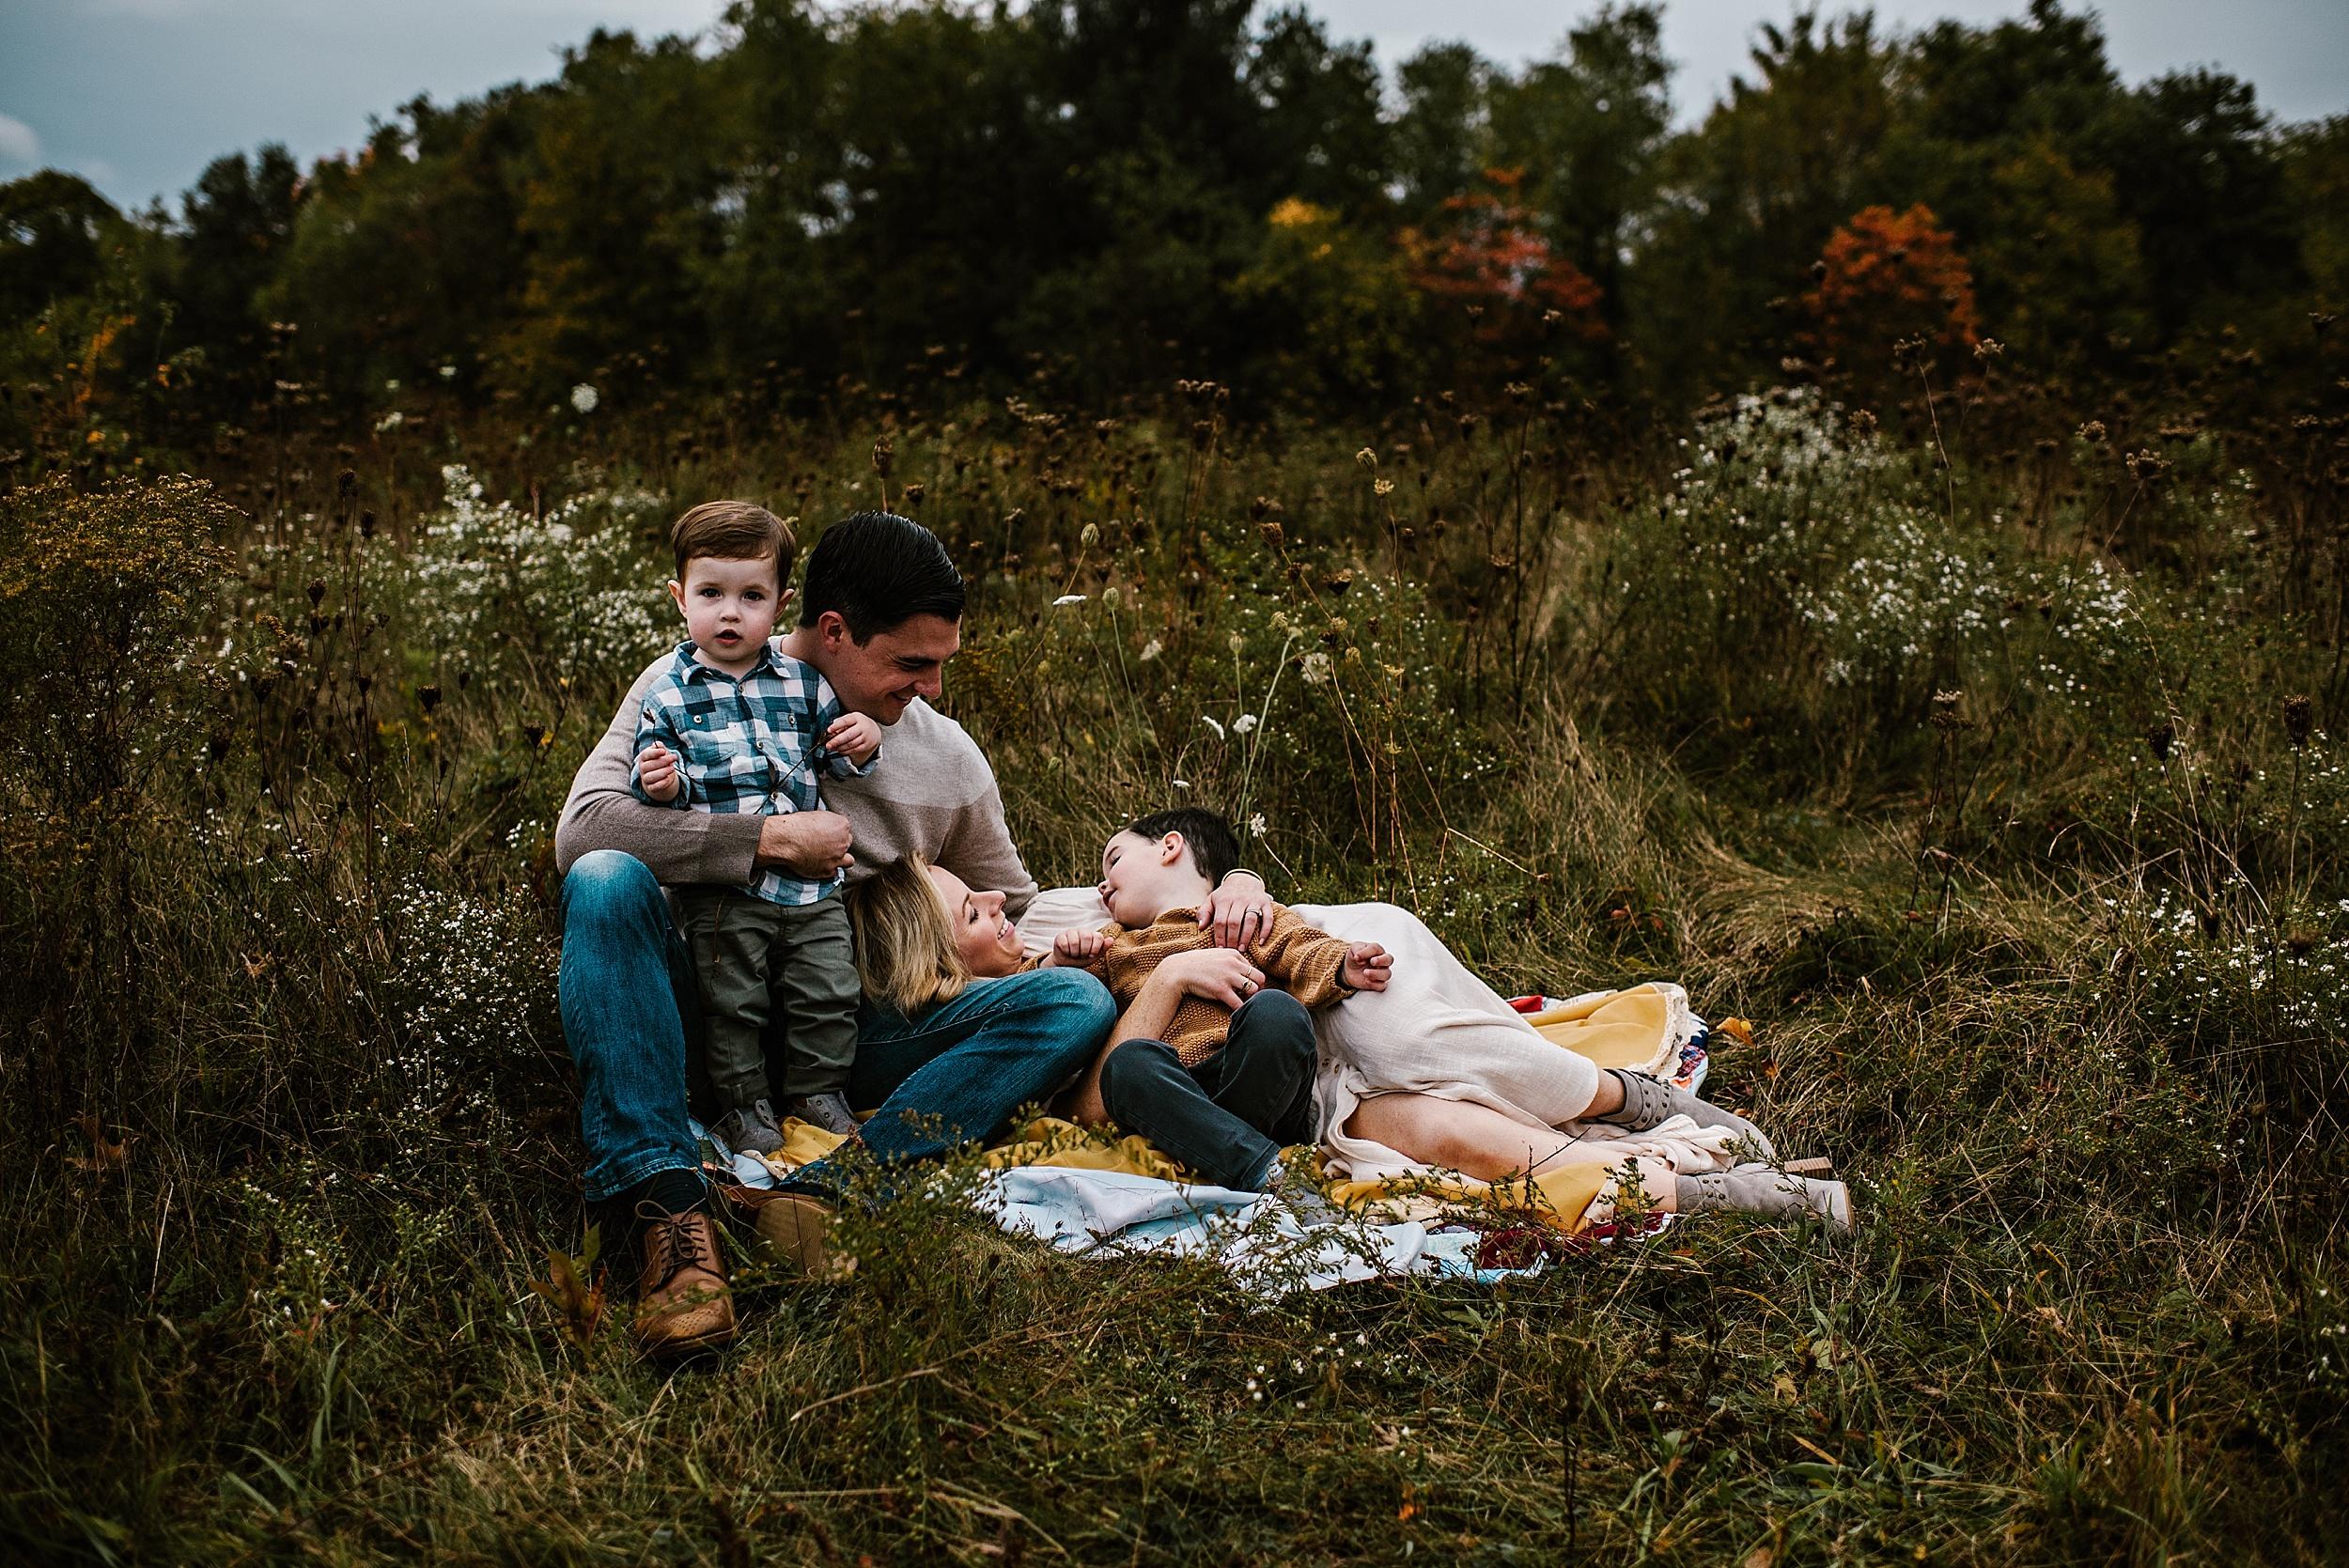 lauren-grayson-photography-portrait-artist-akron-cleveland-ohio-photographer-family-session-fields-sunset-fall_0188.jpg